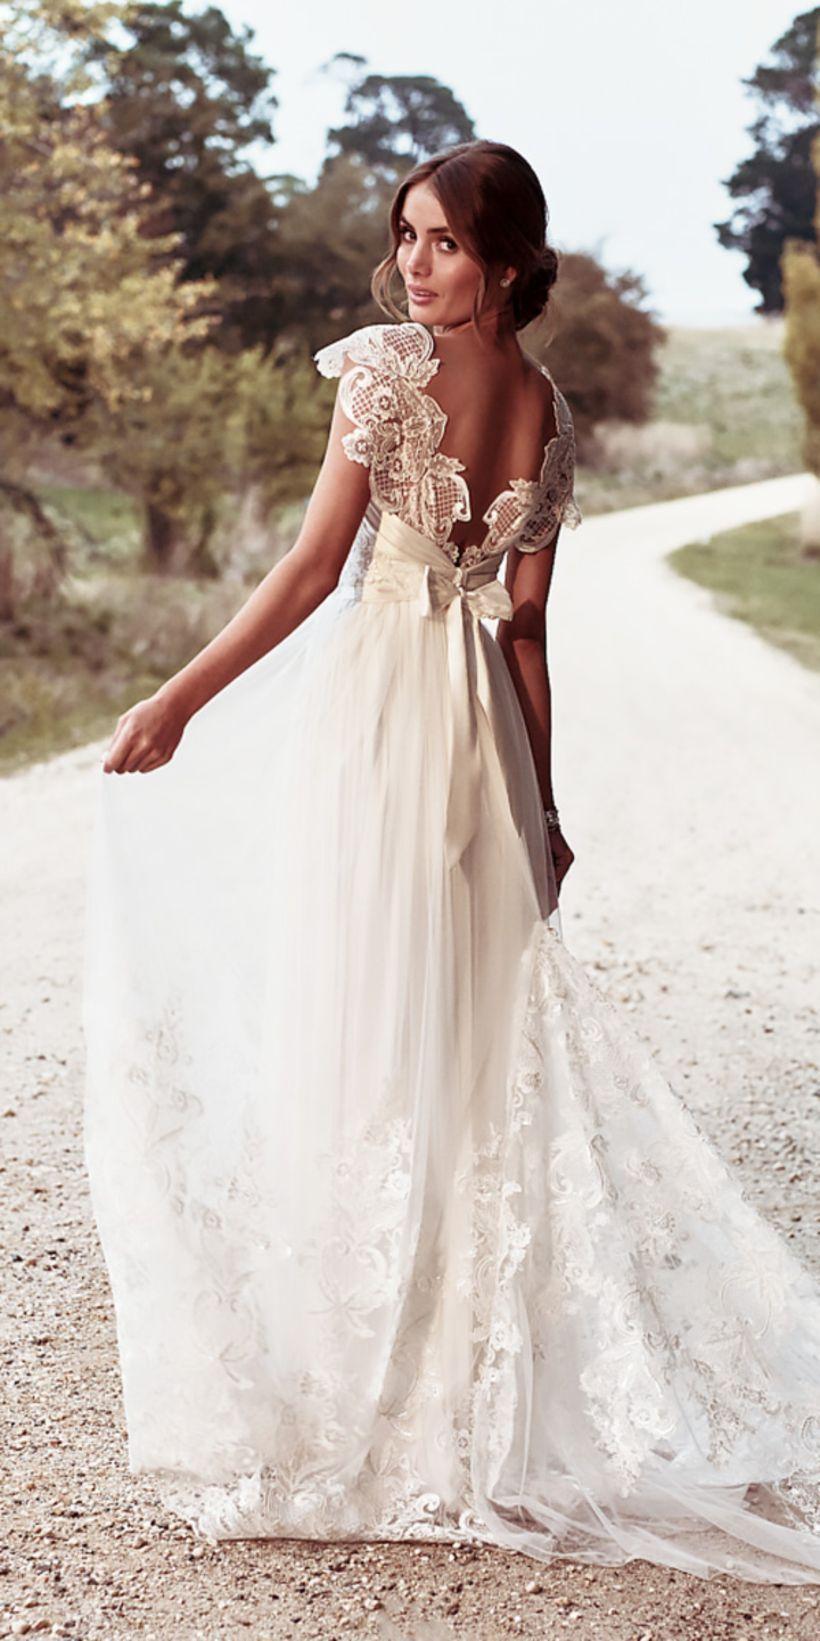 Amazing 68 Vintage Wedding Dress That So Inspired From Https Fashionetter Com 2 Destination Wedding Dress Vintage Inspired Wedding Dresses Ball Gowns Wedding